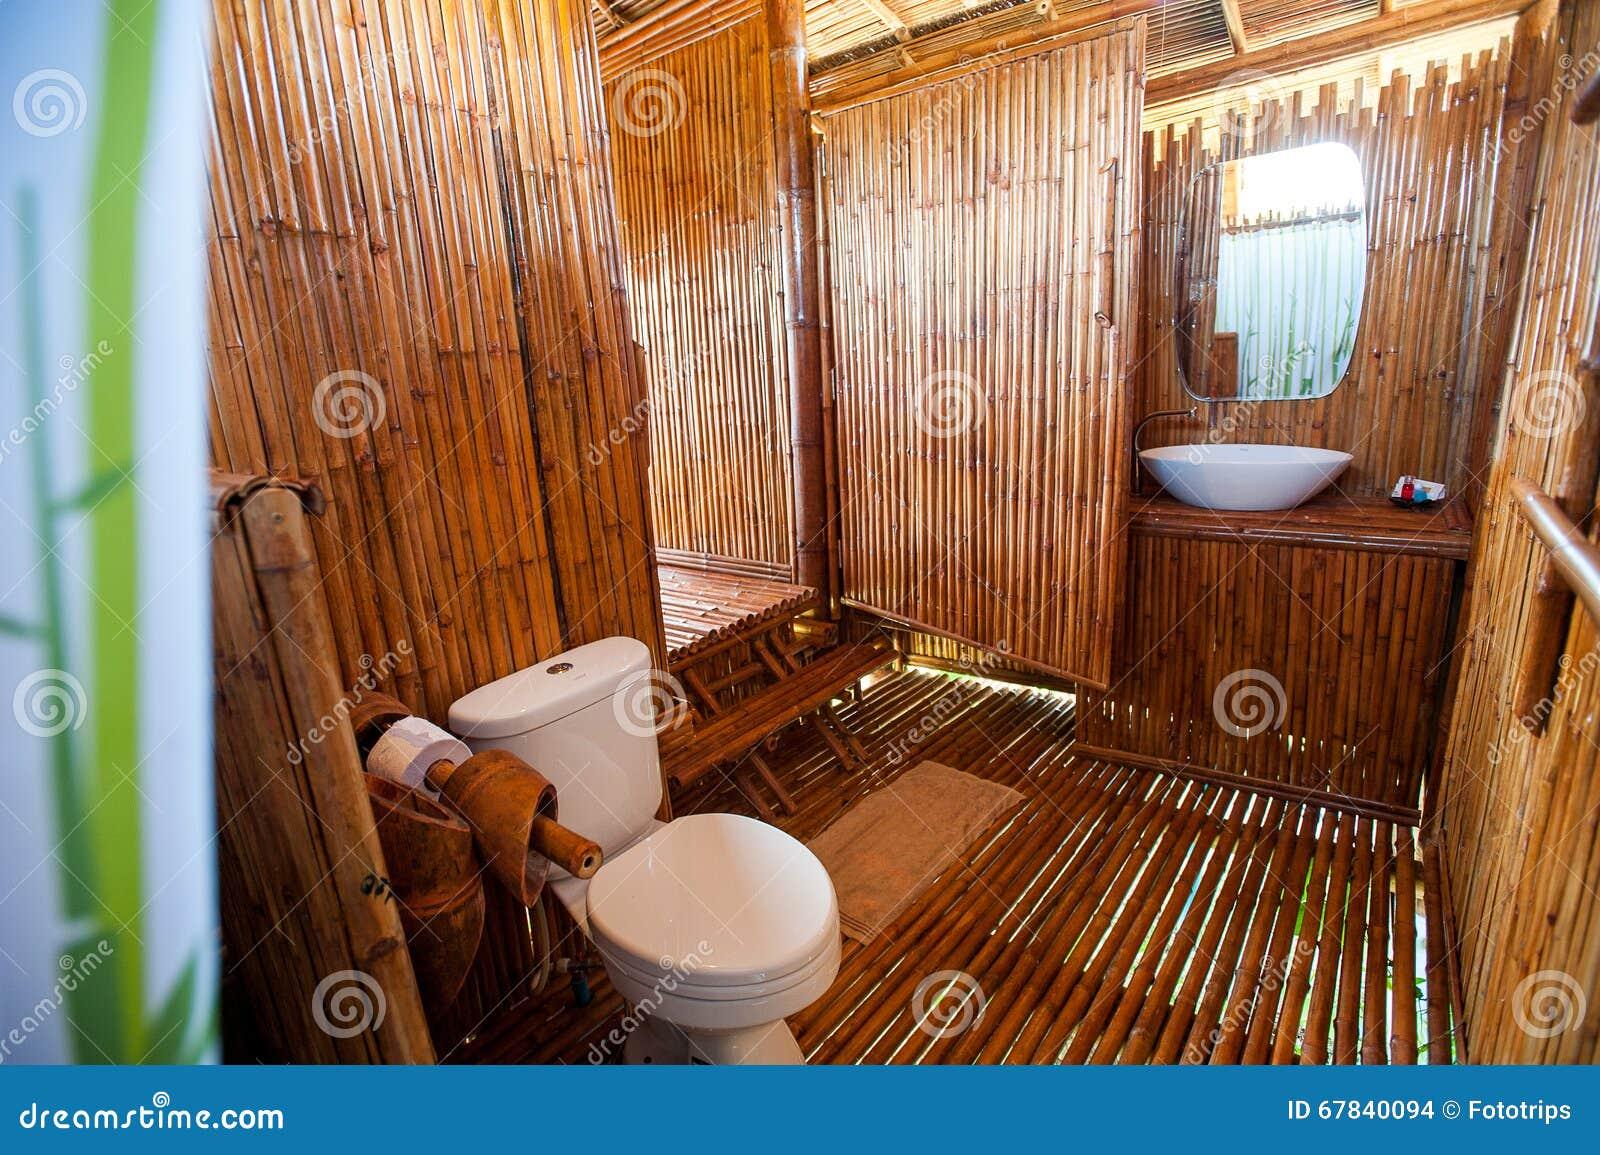 bathroom bamboo with masonry shower cubicle and bathtub stock